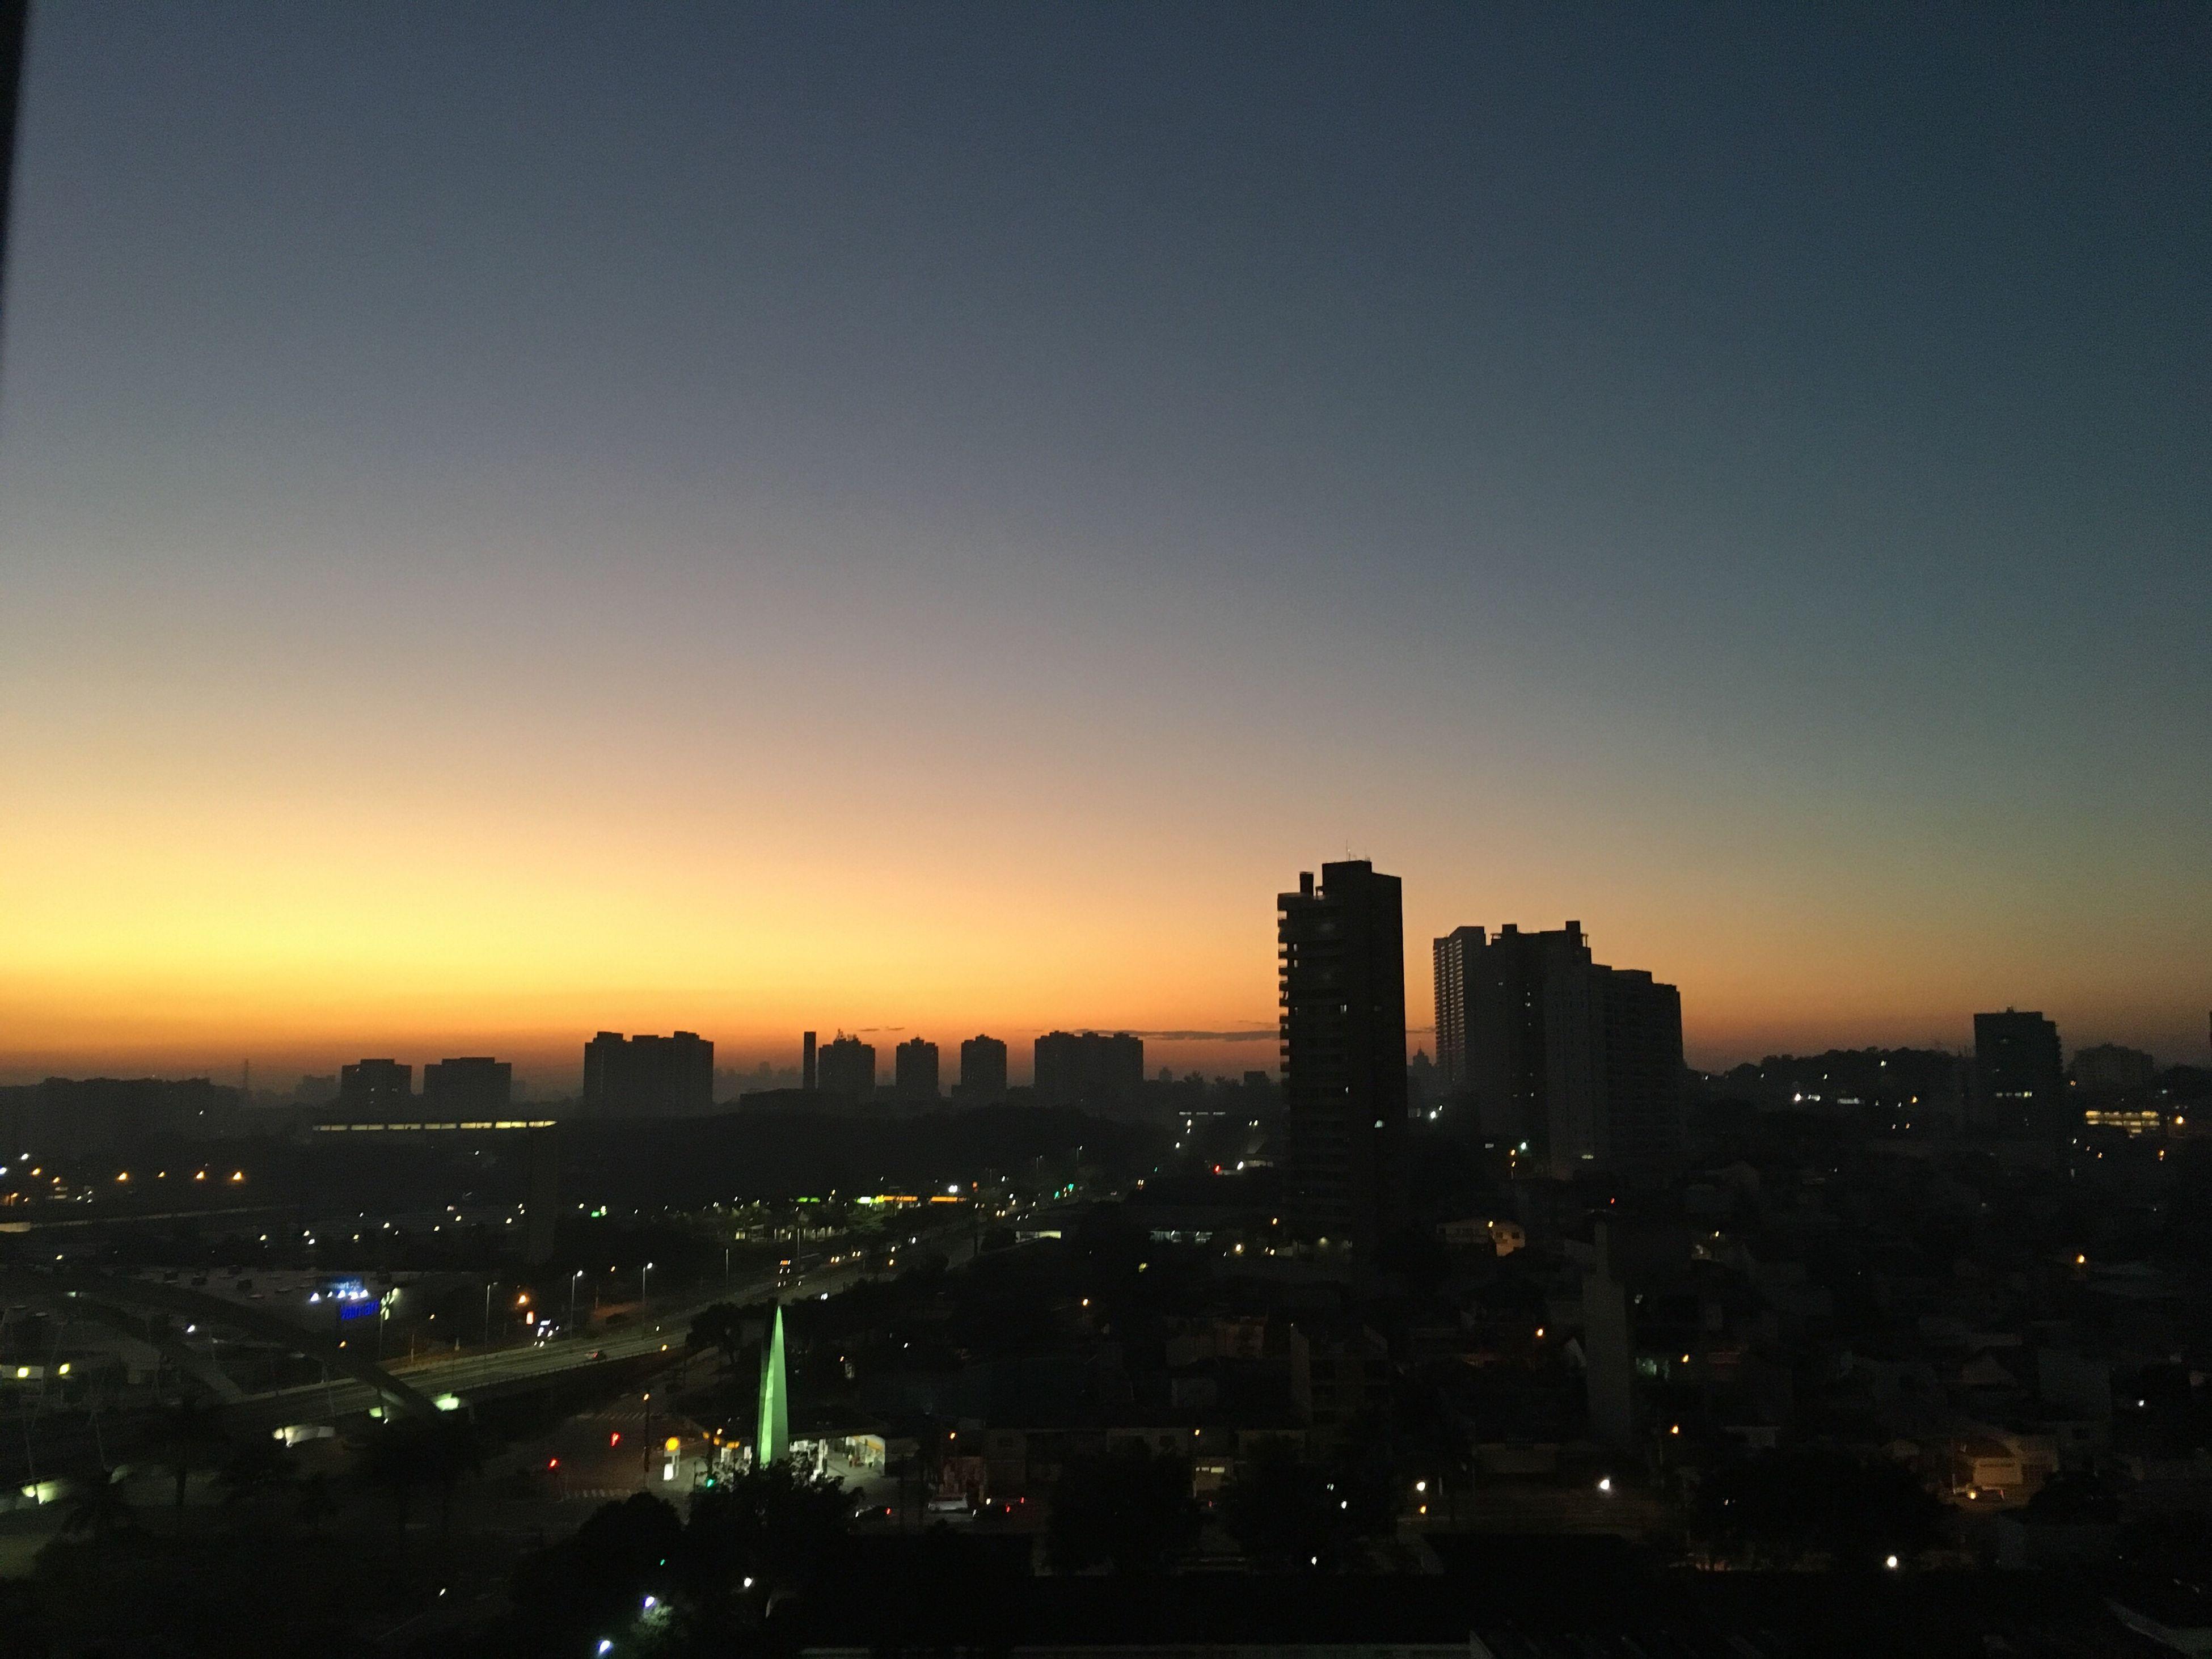 architecture, building exterior, skyscraper, city, cityscape, illuminated, built structure, no people, modern, sunset, travel destinations, sky, outdoors, night, urban skyline